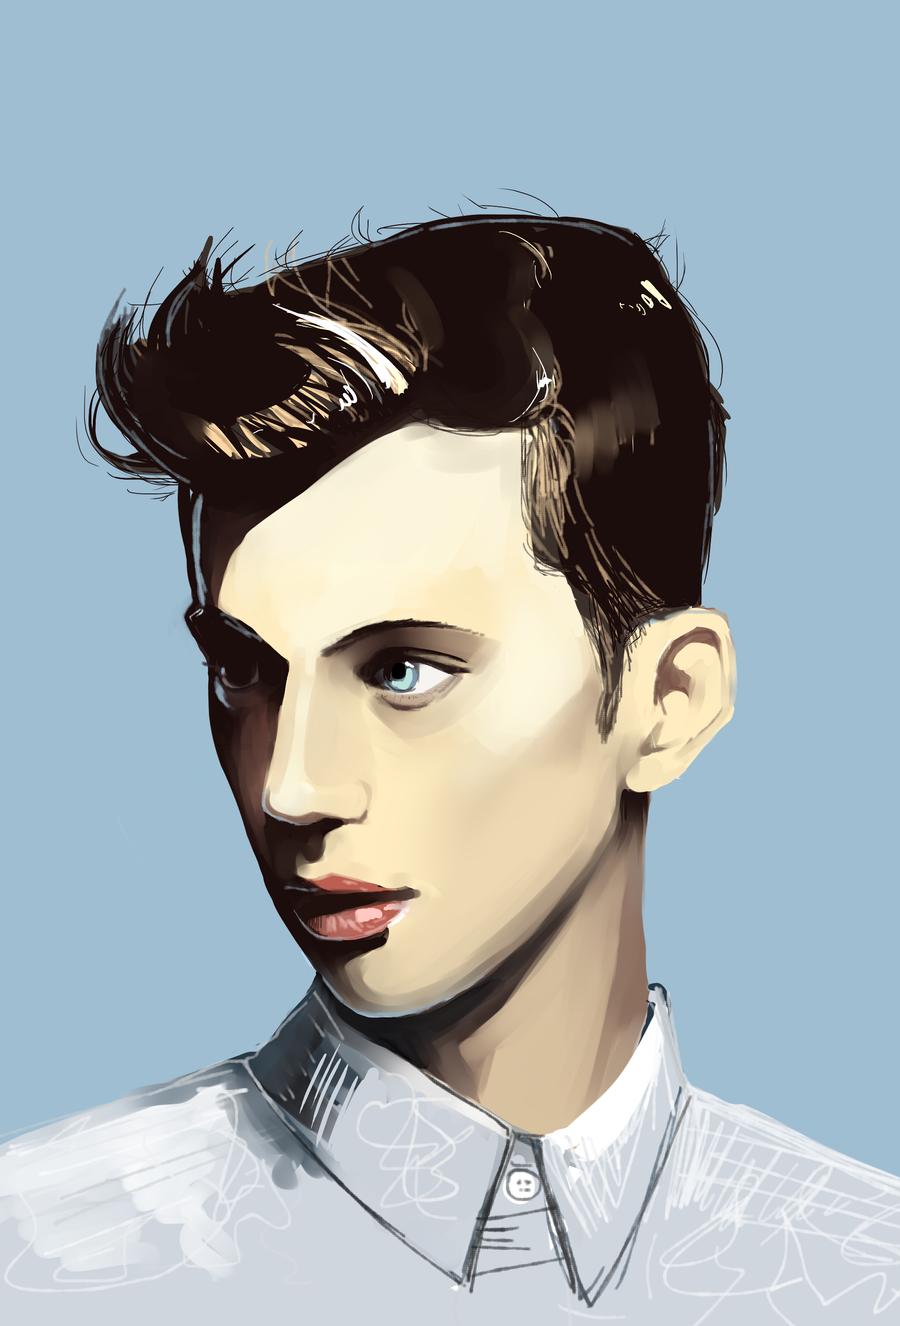 Troye Sivan by incaseyouart on DeviantArt